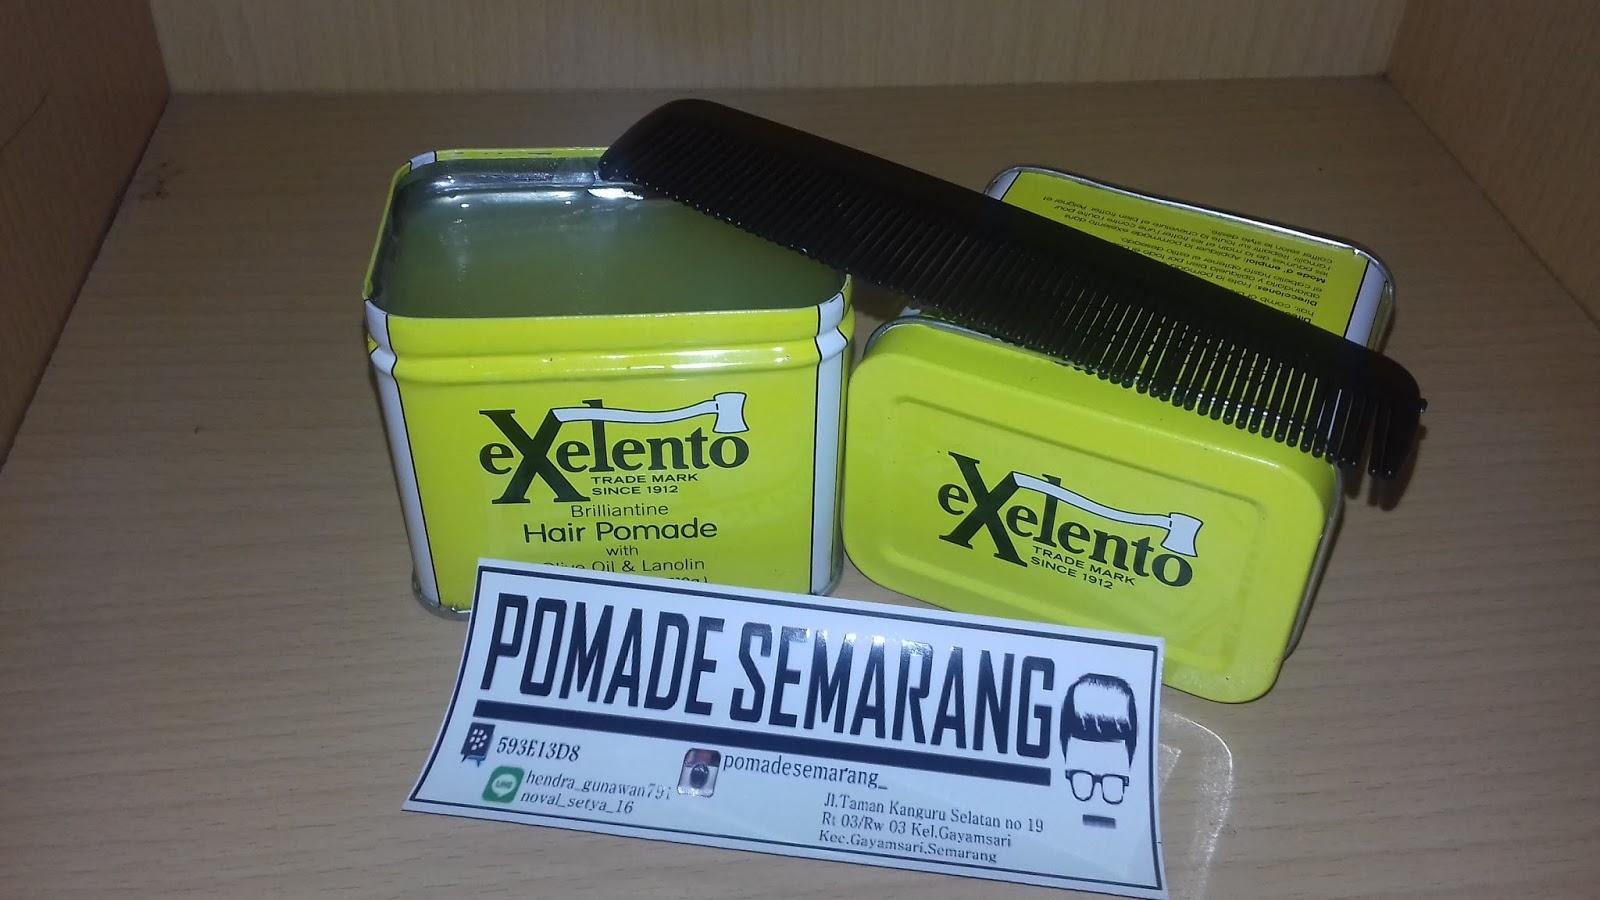 Pomade Semarang Jual Pomade Daerah Semarang